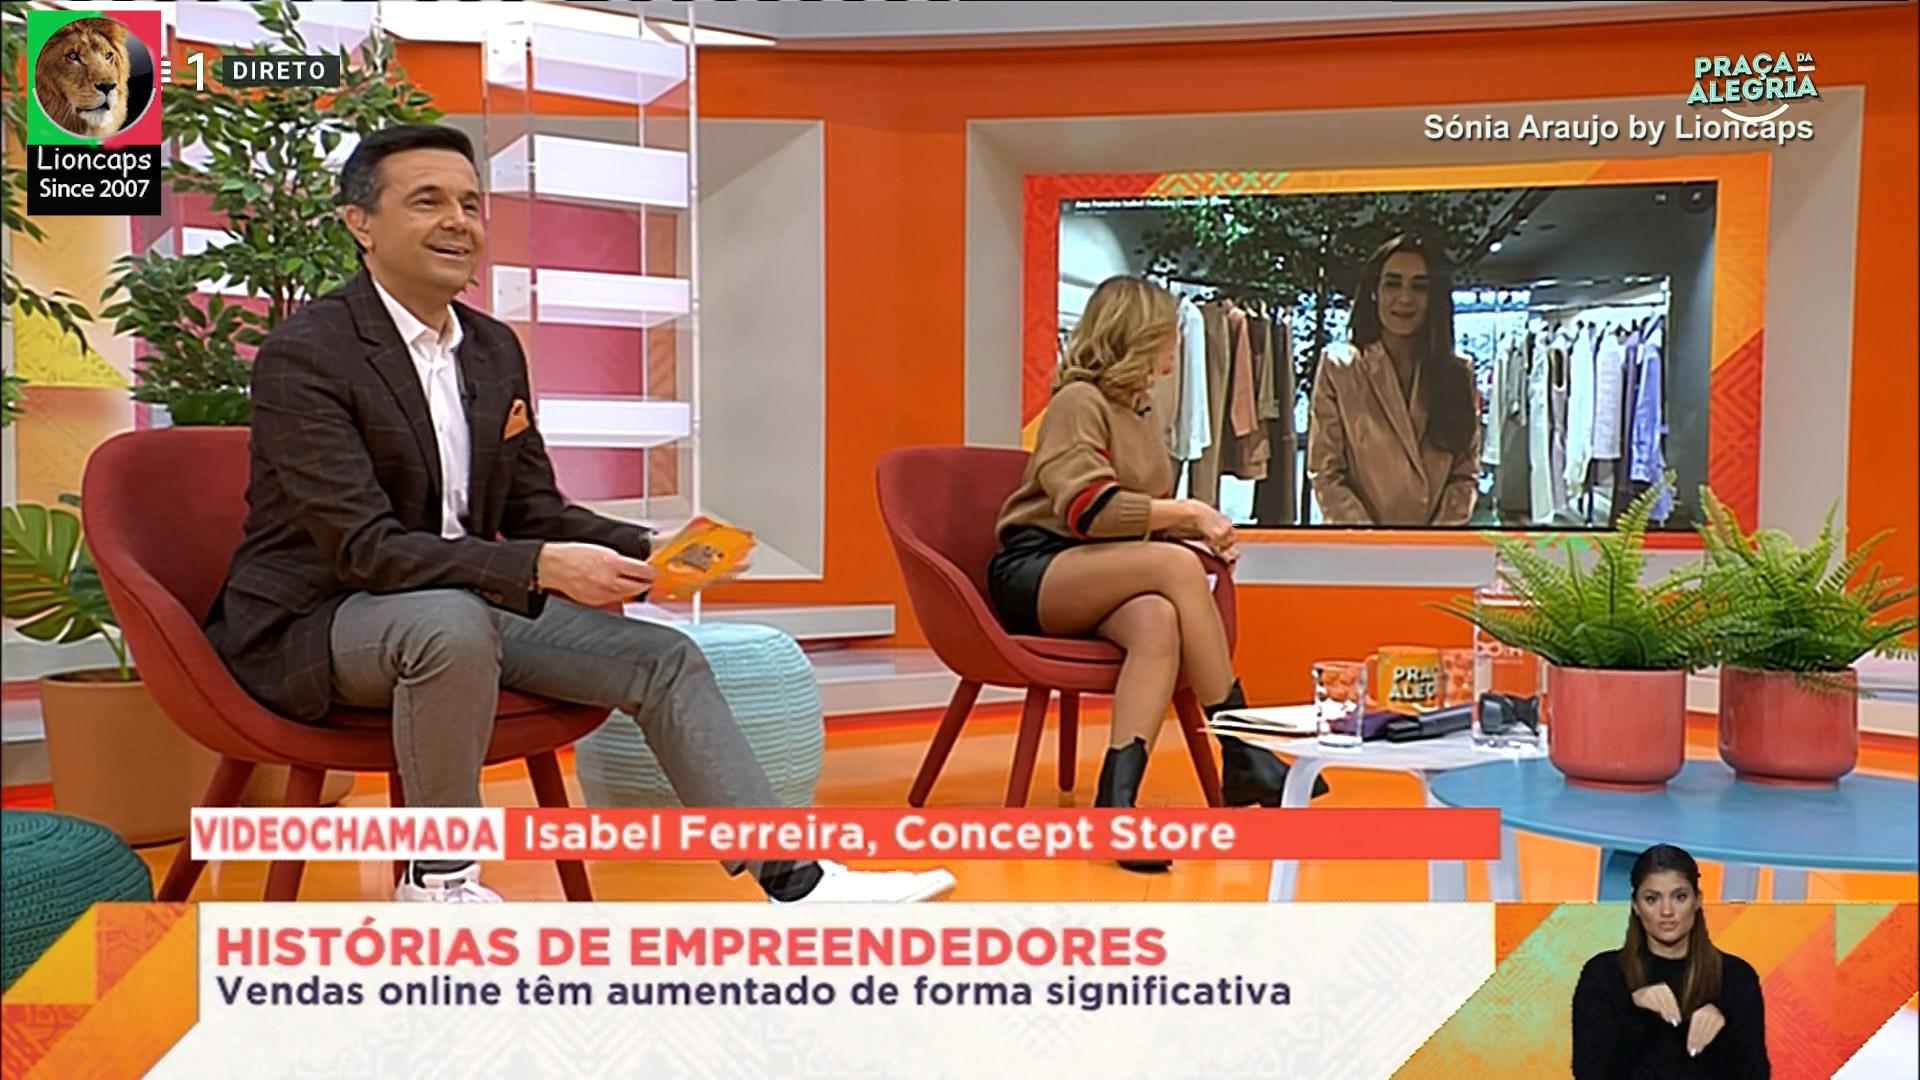 sonia_araujo_praca_lioncaps_27_03_2021_03 (3).jpg